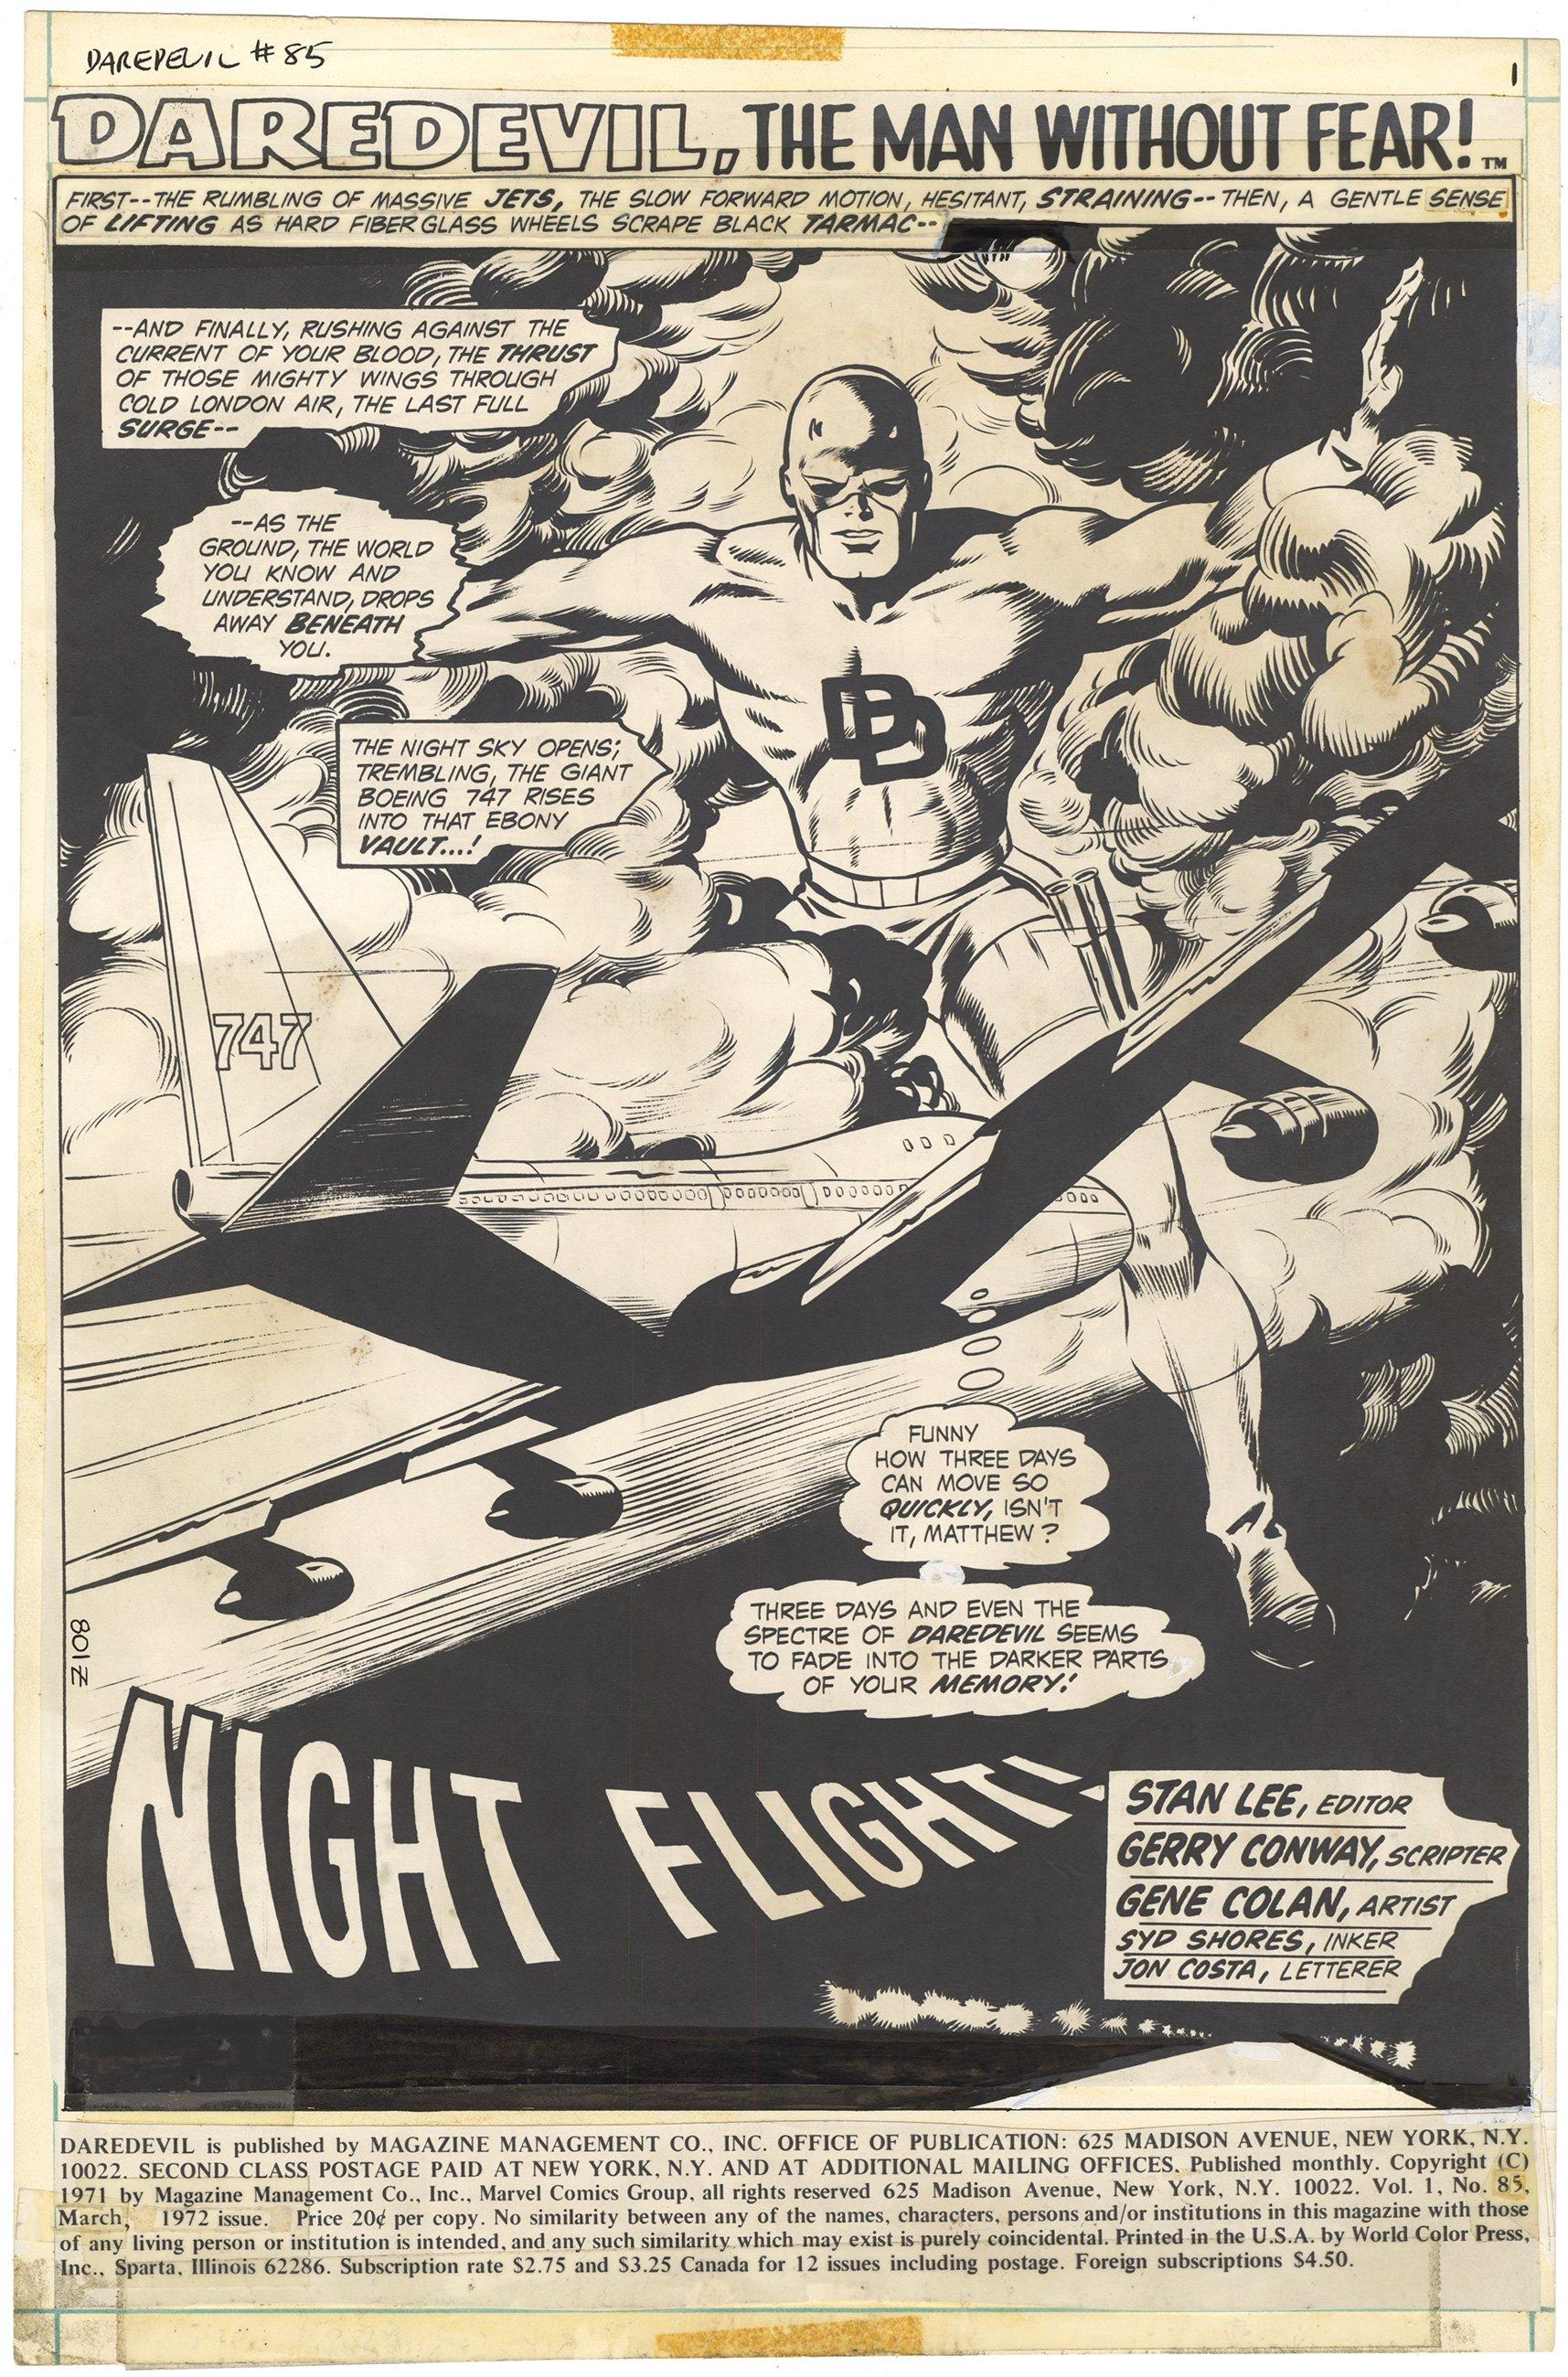 Daredevil #85 p1 (Mostly Stat)